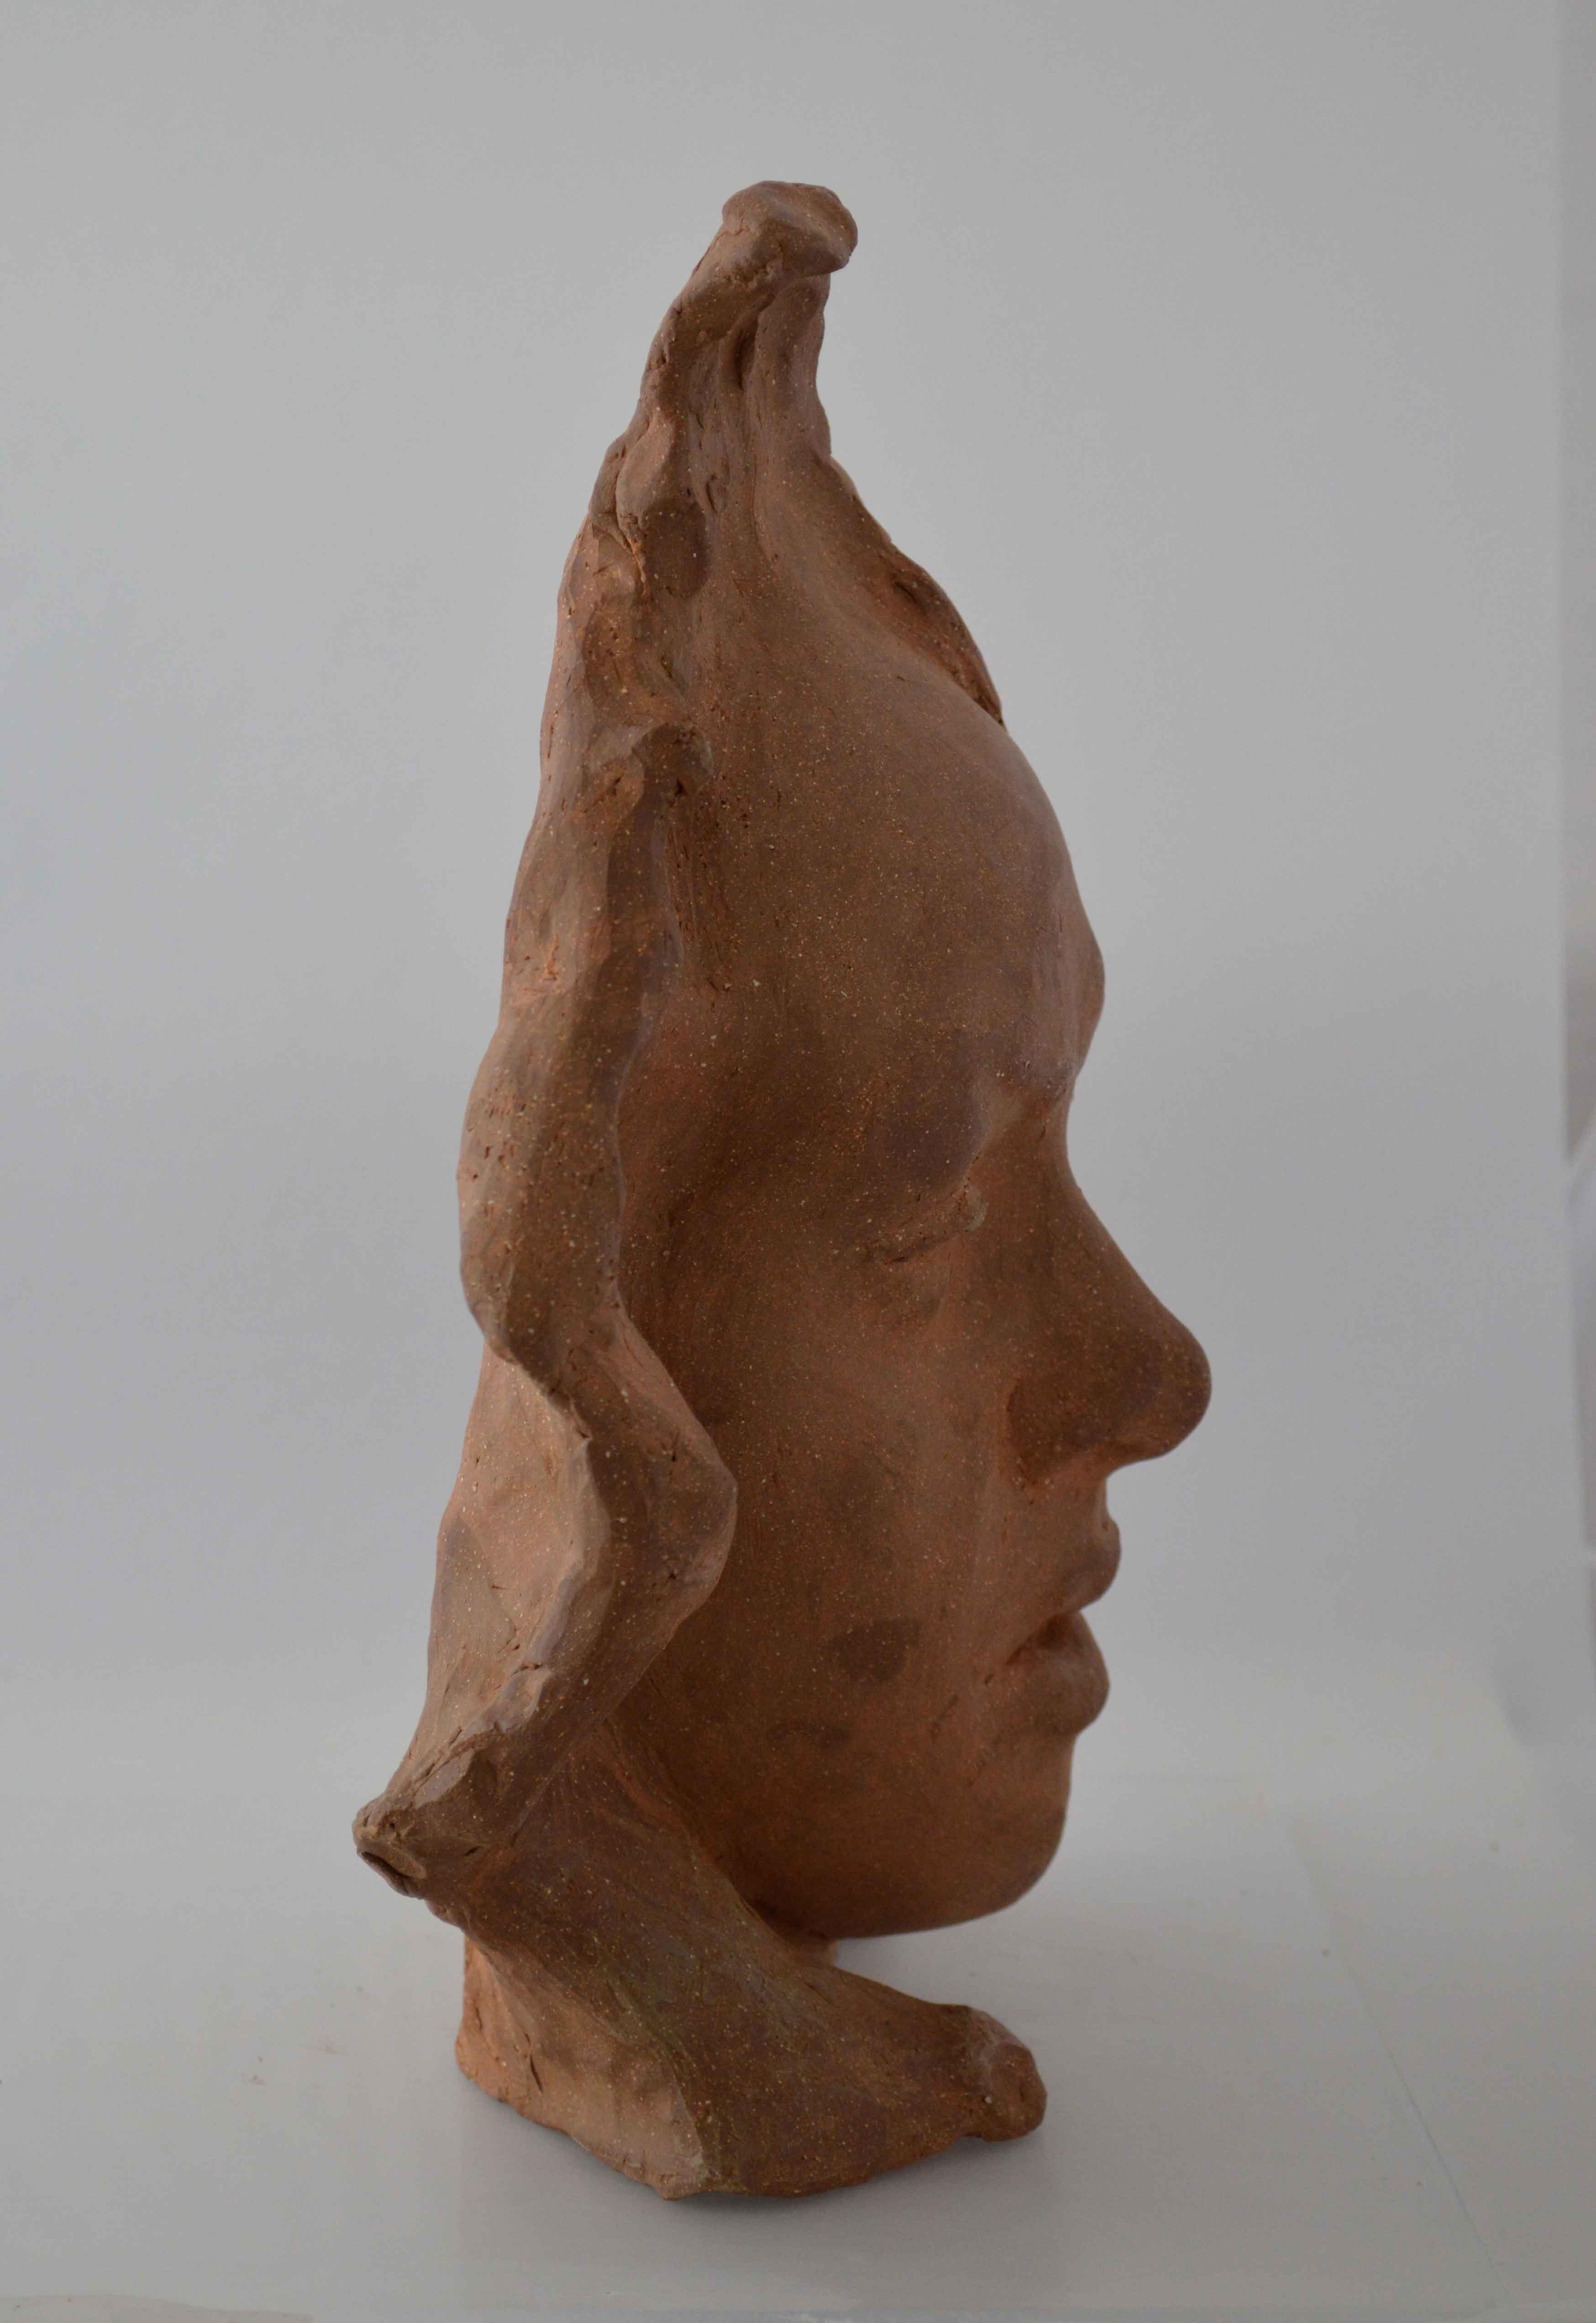 Melissa by  Daud Akhriev - Masterpiece Online